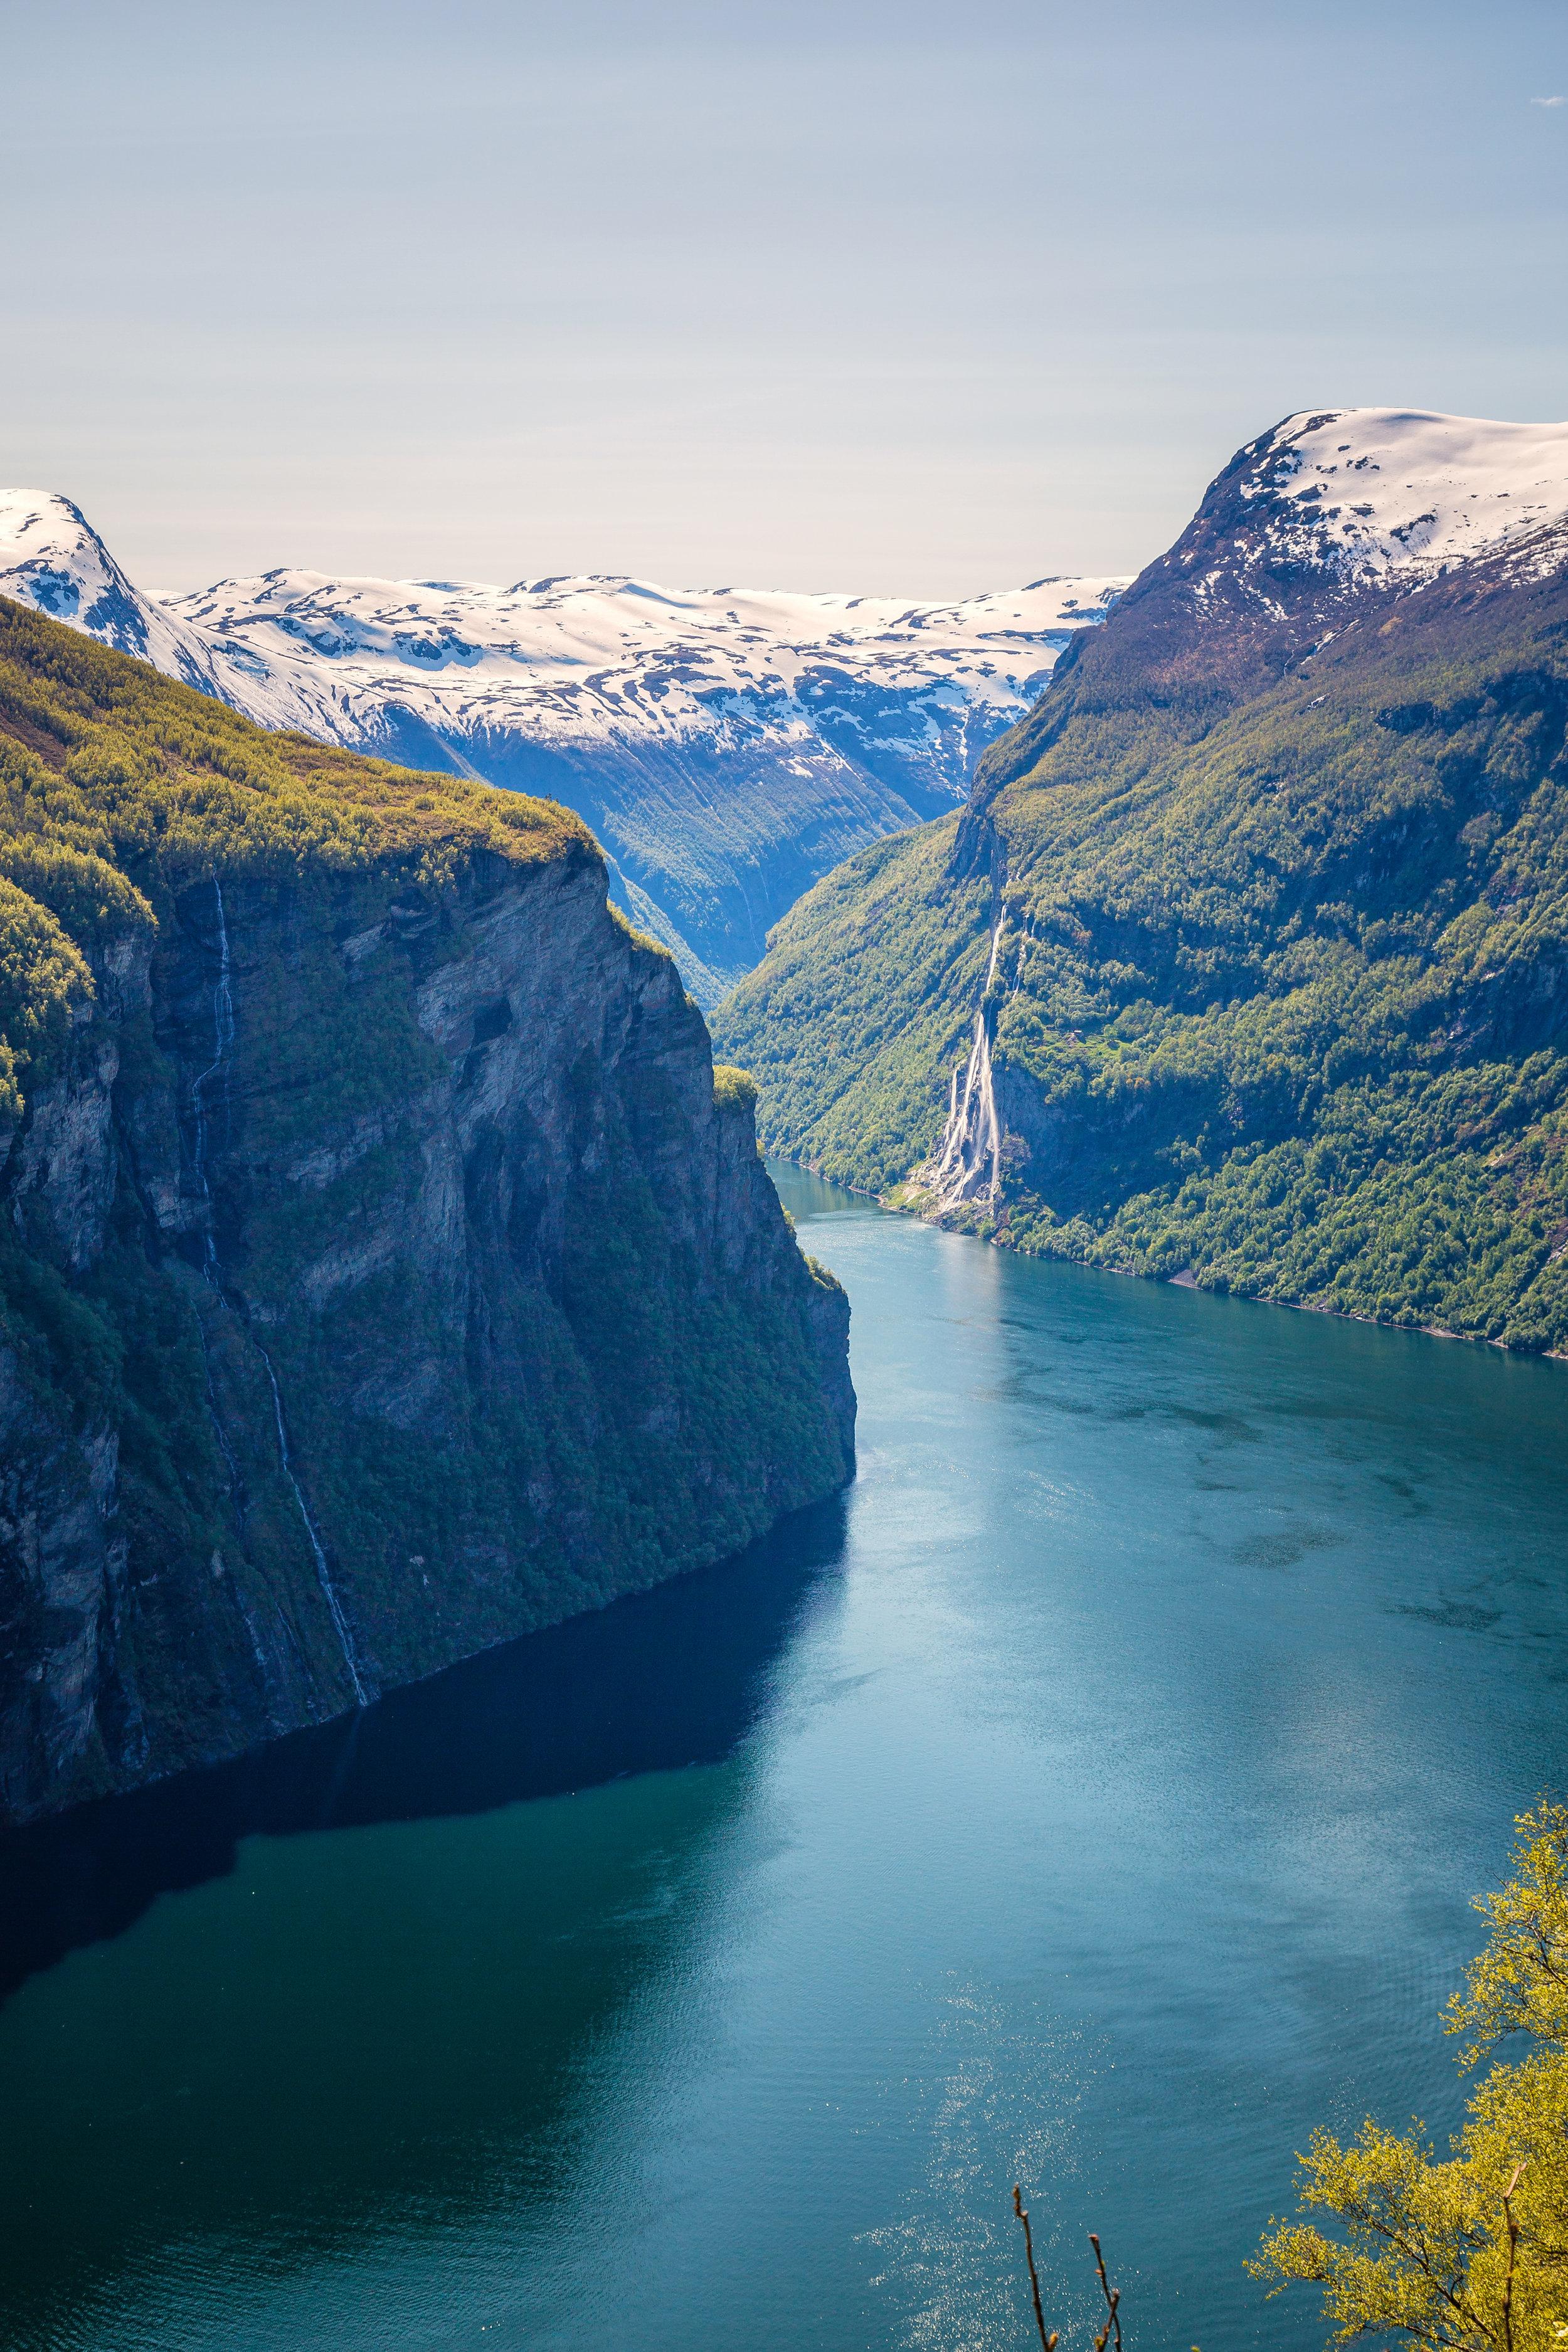 Norway (Fjords) -